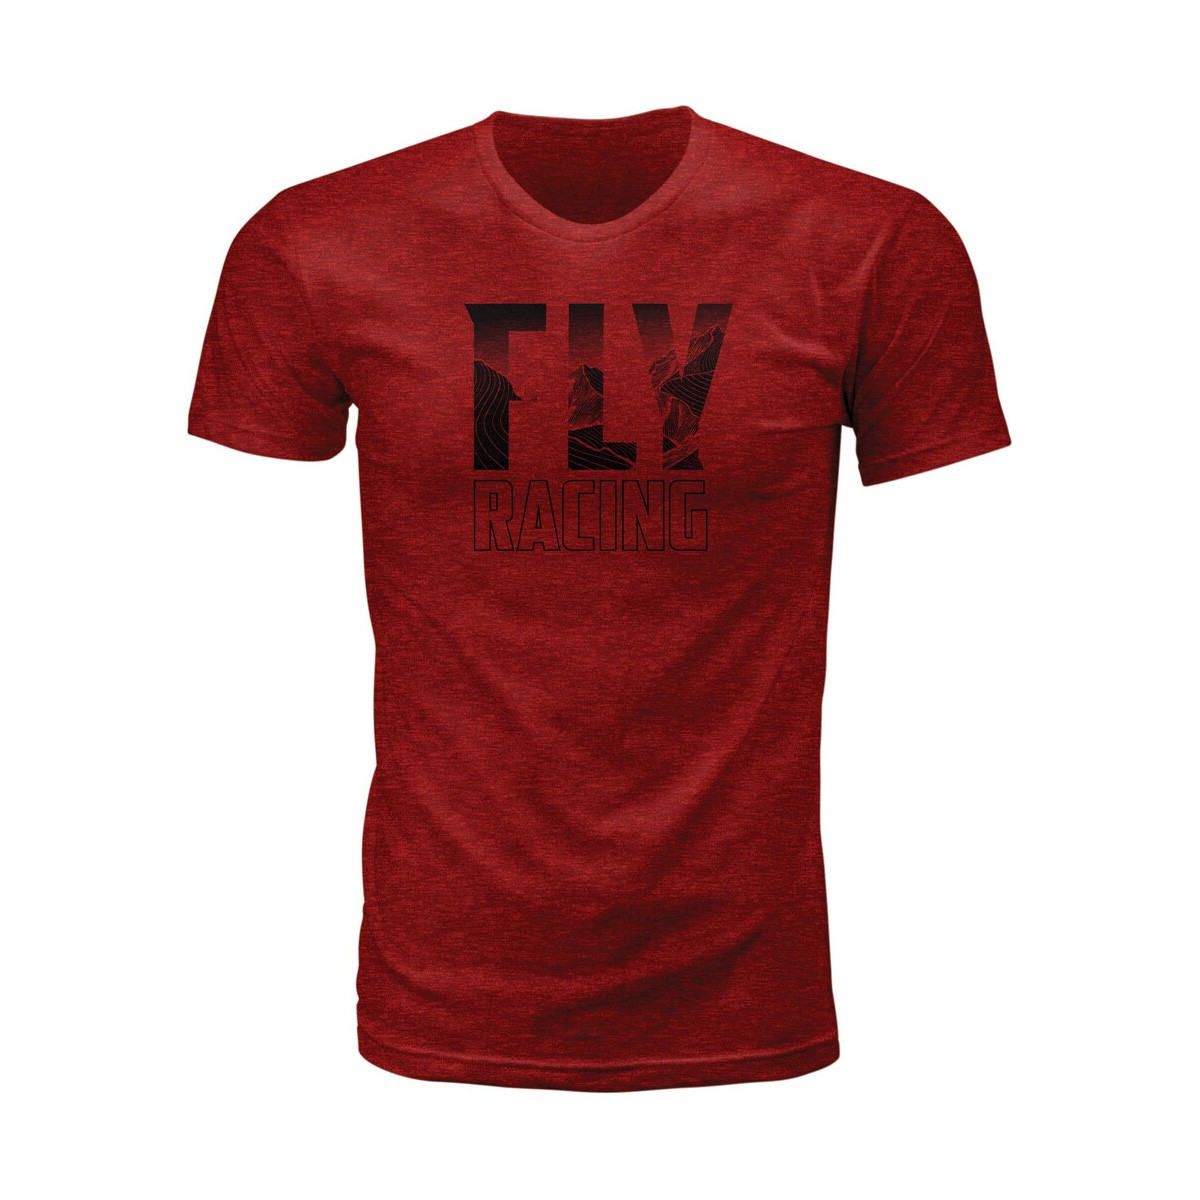 FLY MOUNTAIN TEE